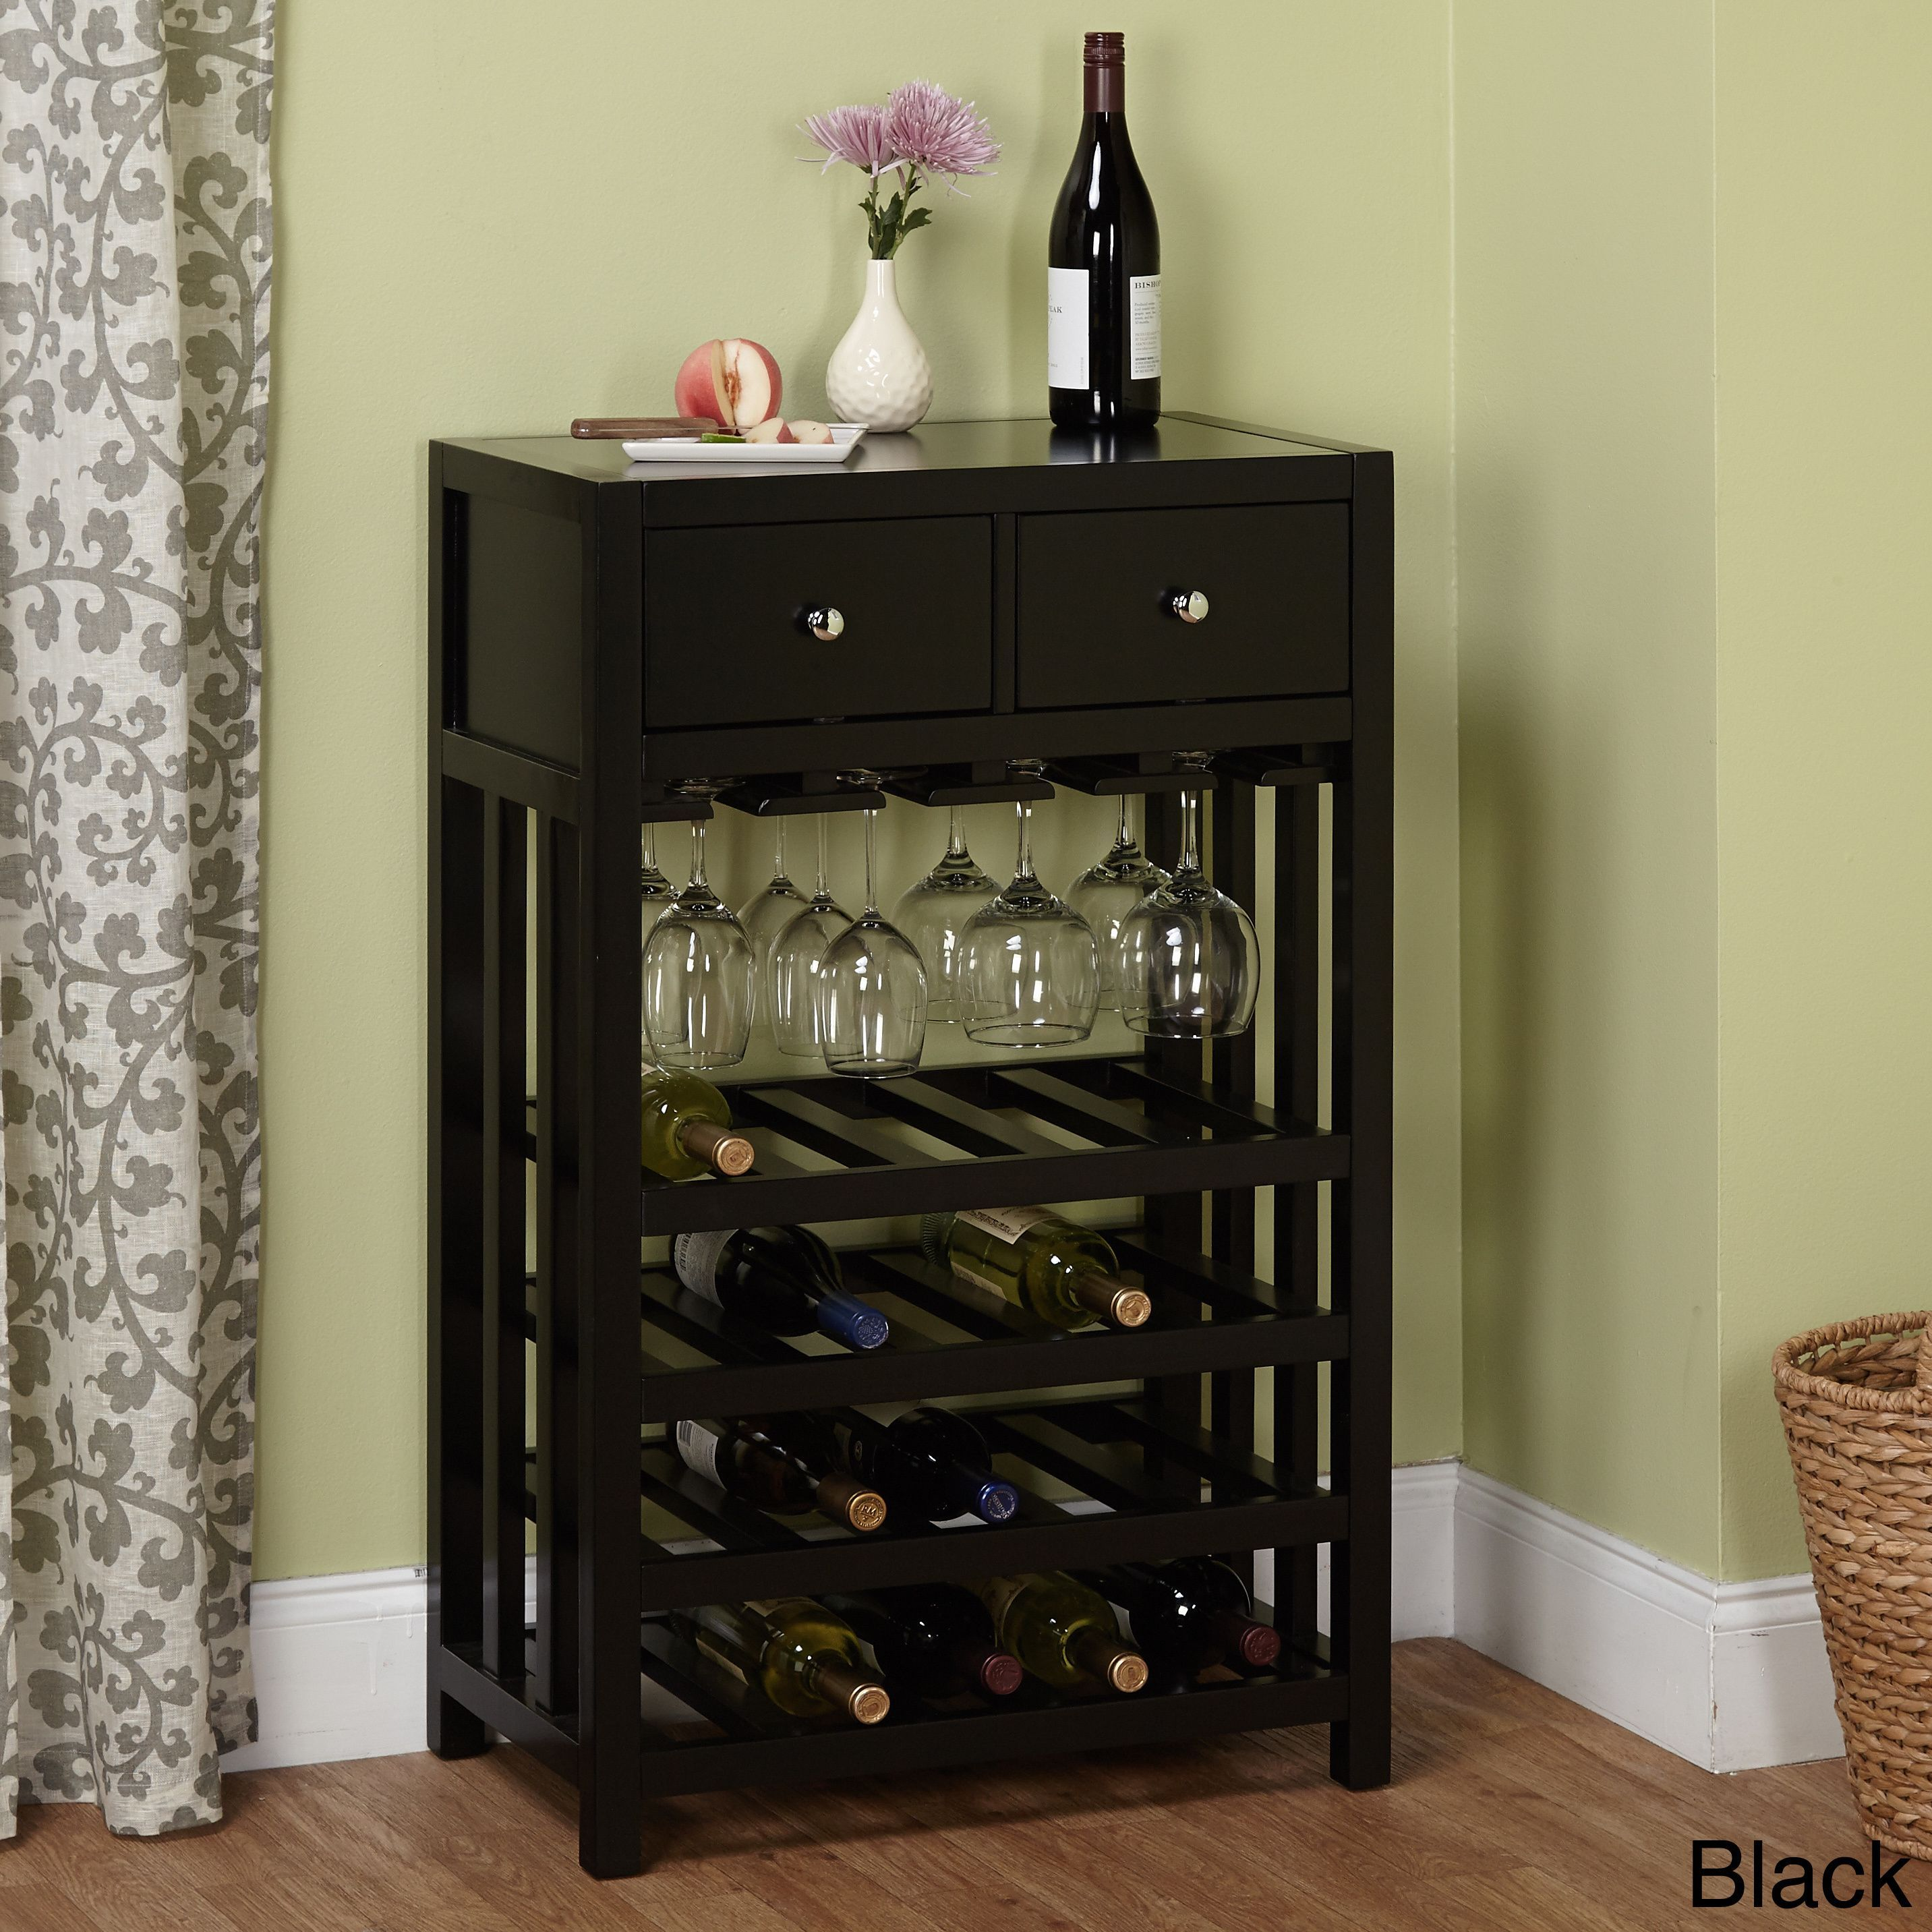 Simple Living Napa Wood 20 bottle Wine Tower Black